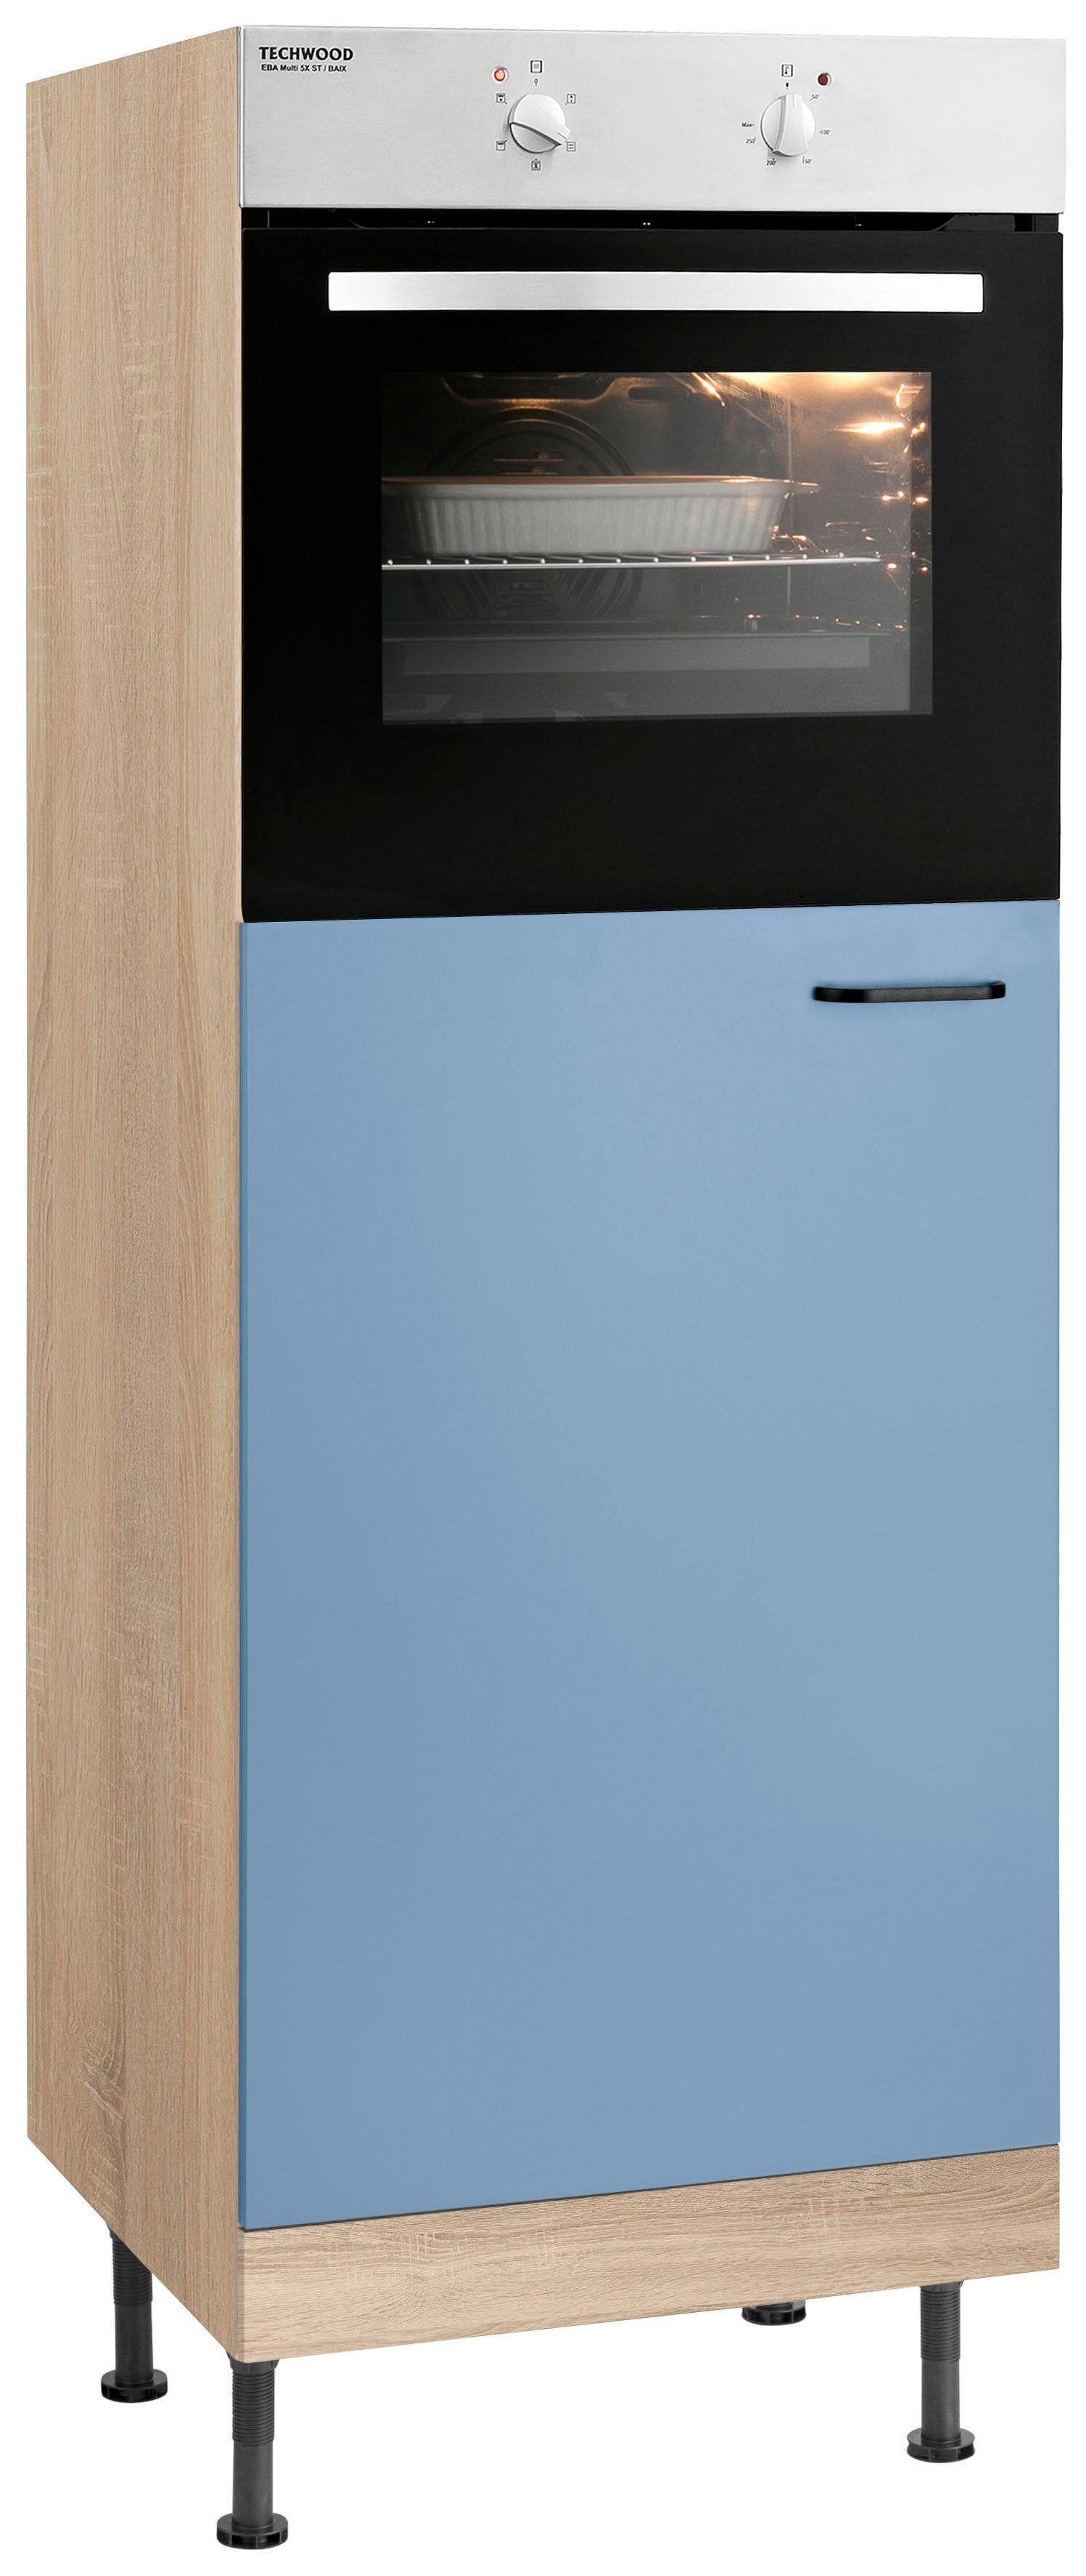 OPTIFIT Backofen/Kühlumbauschrank »Elga«, Breite 60 cm, lichtblau/eichefarben